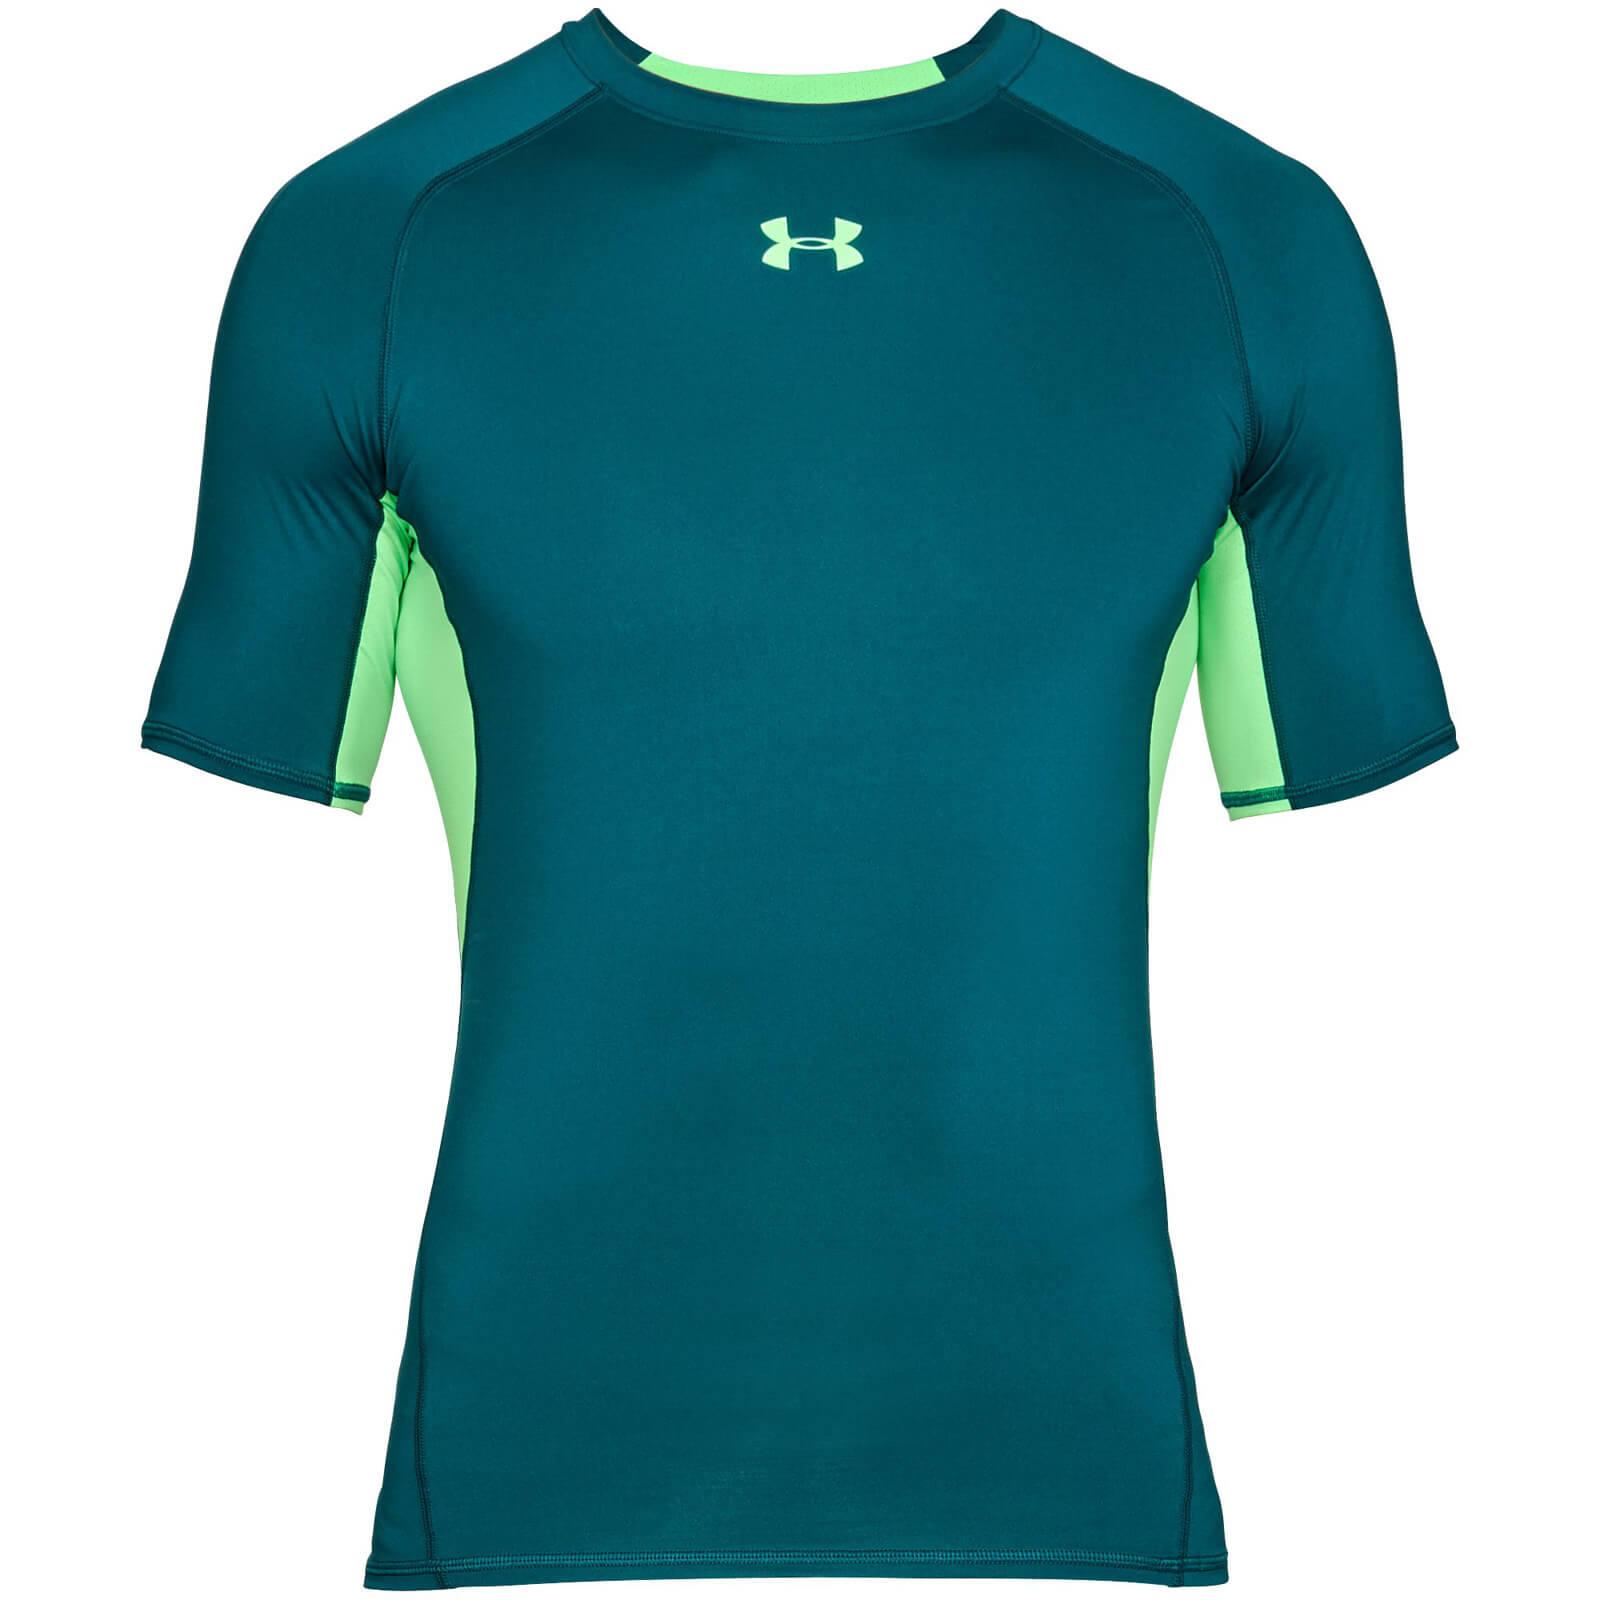 3b4159171 Under Armour Men's HG Armour T-Shirt - Green | ProBikeKit UK